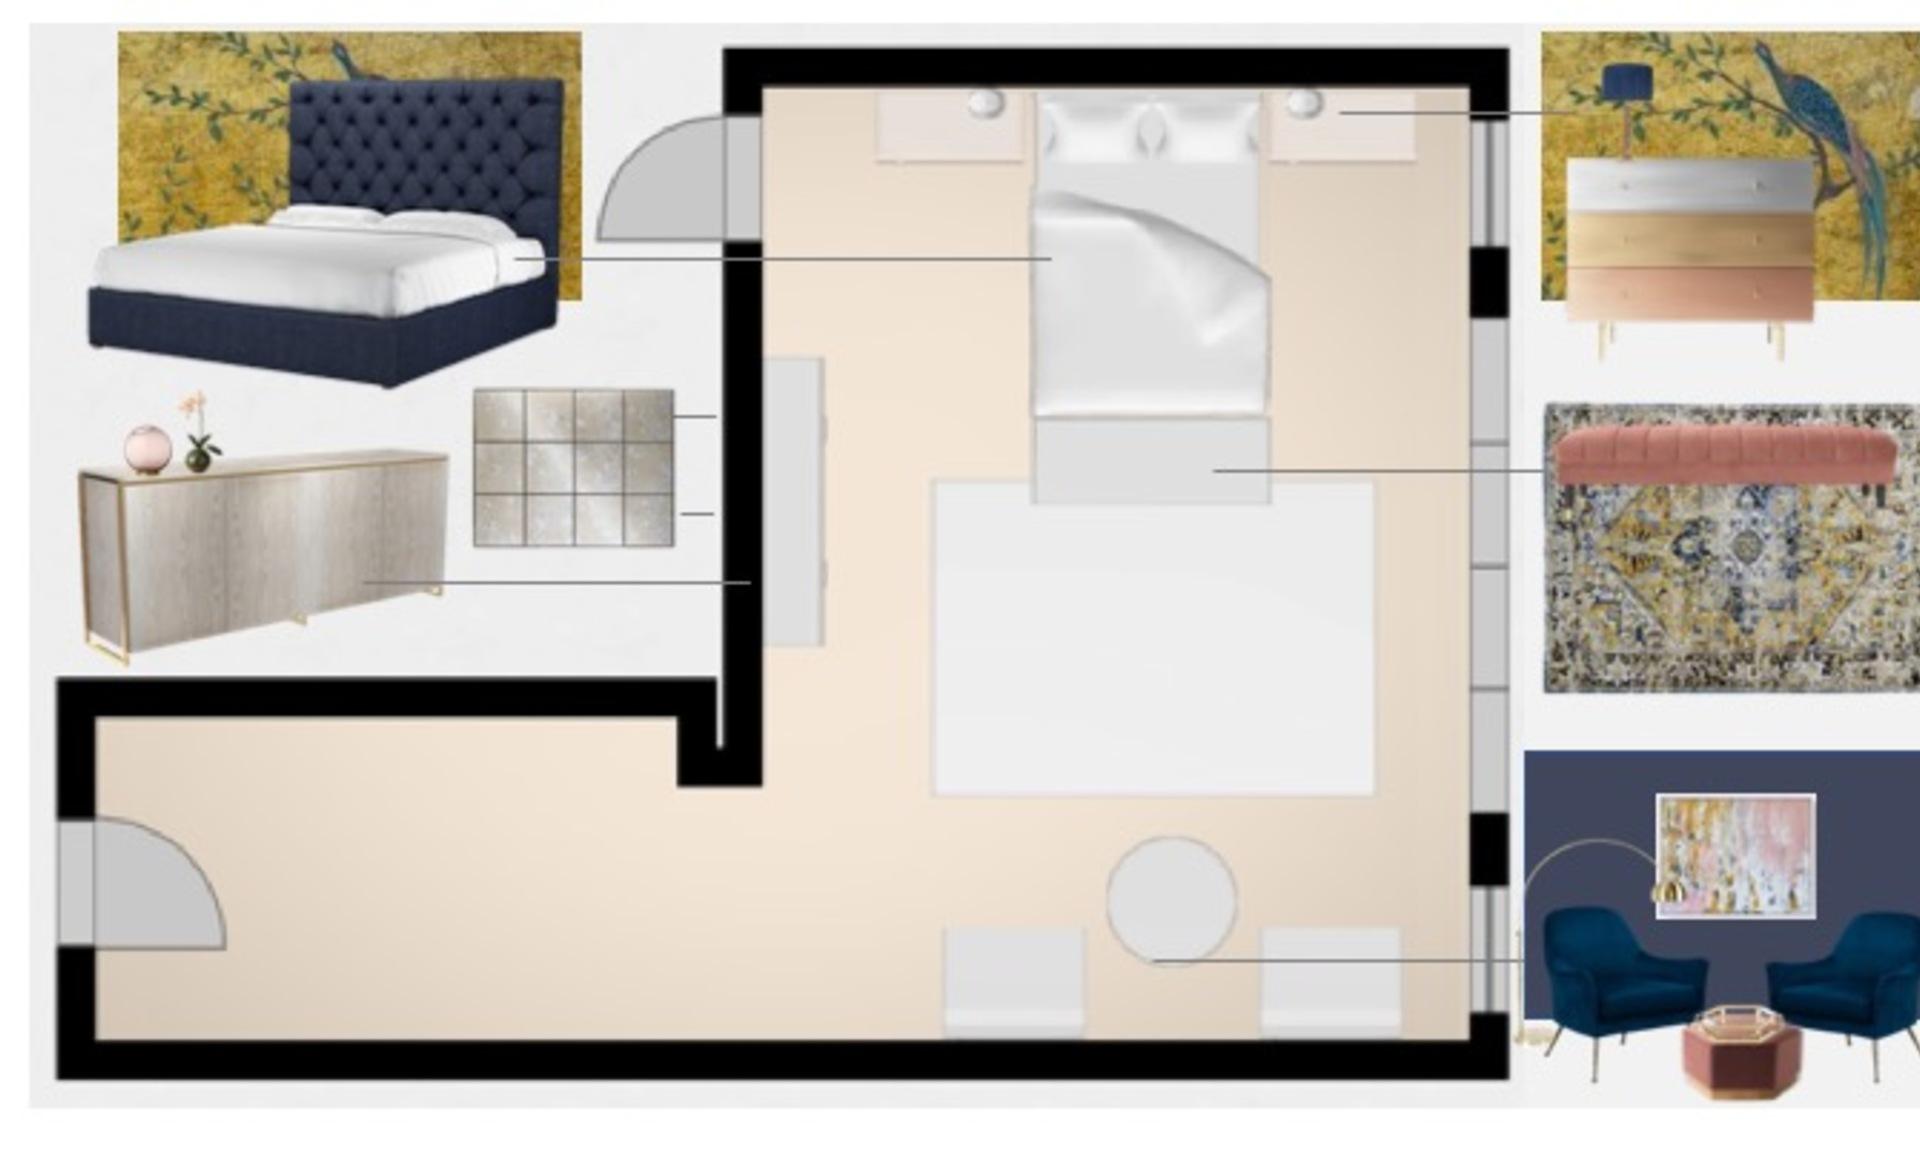 Mbr carolhanda masterbedroom floorplan